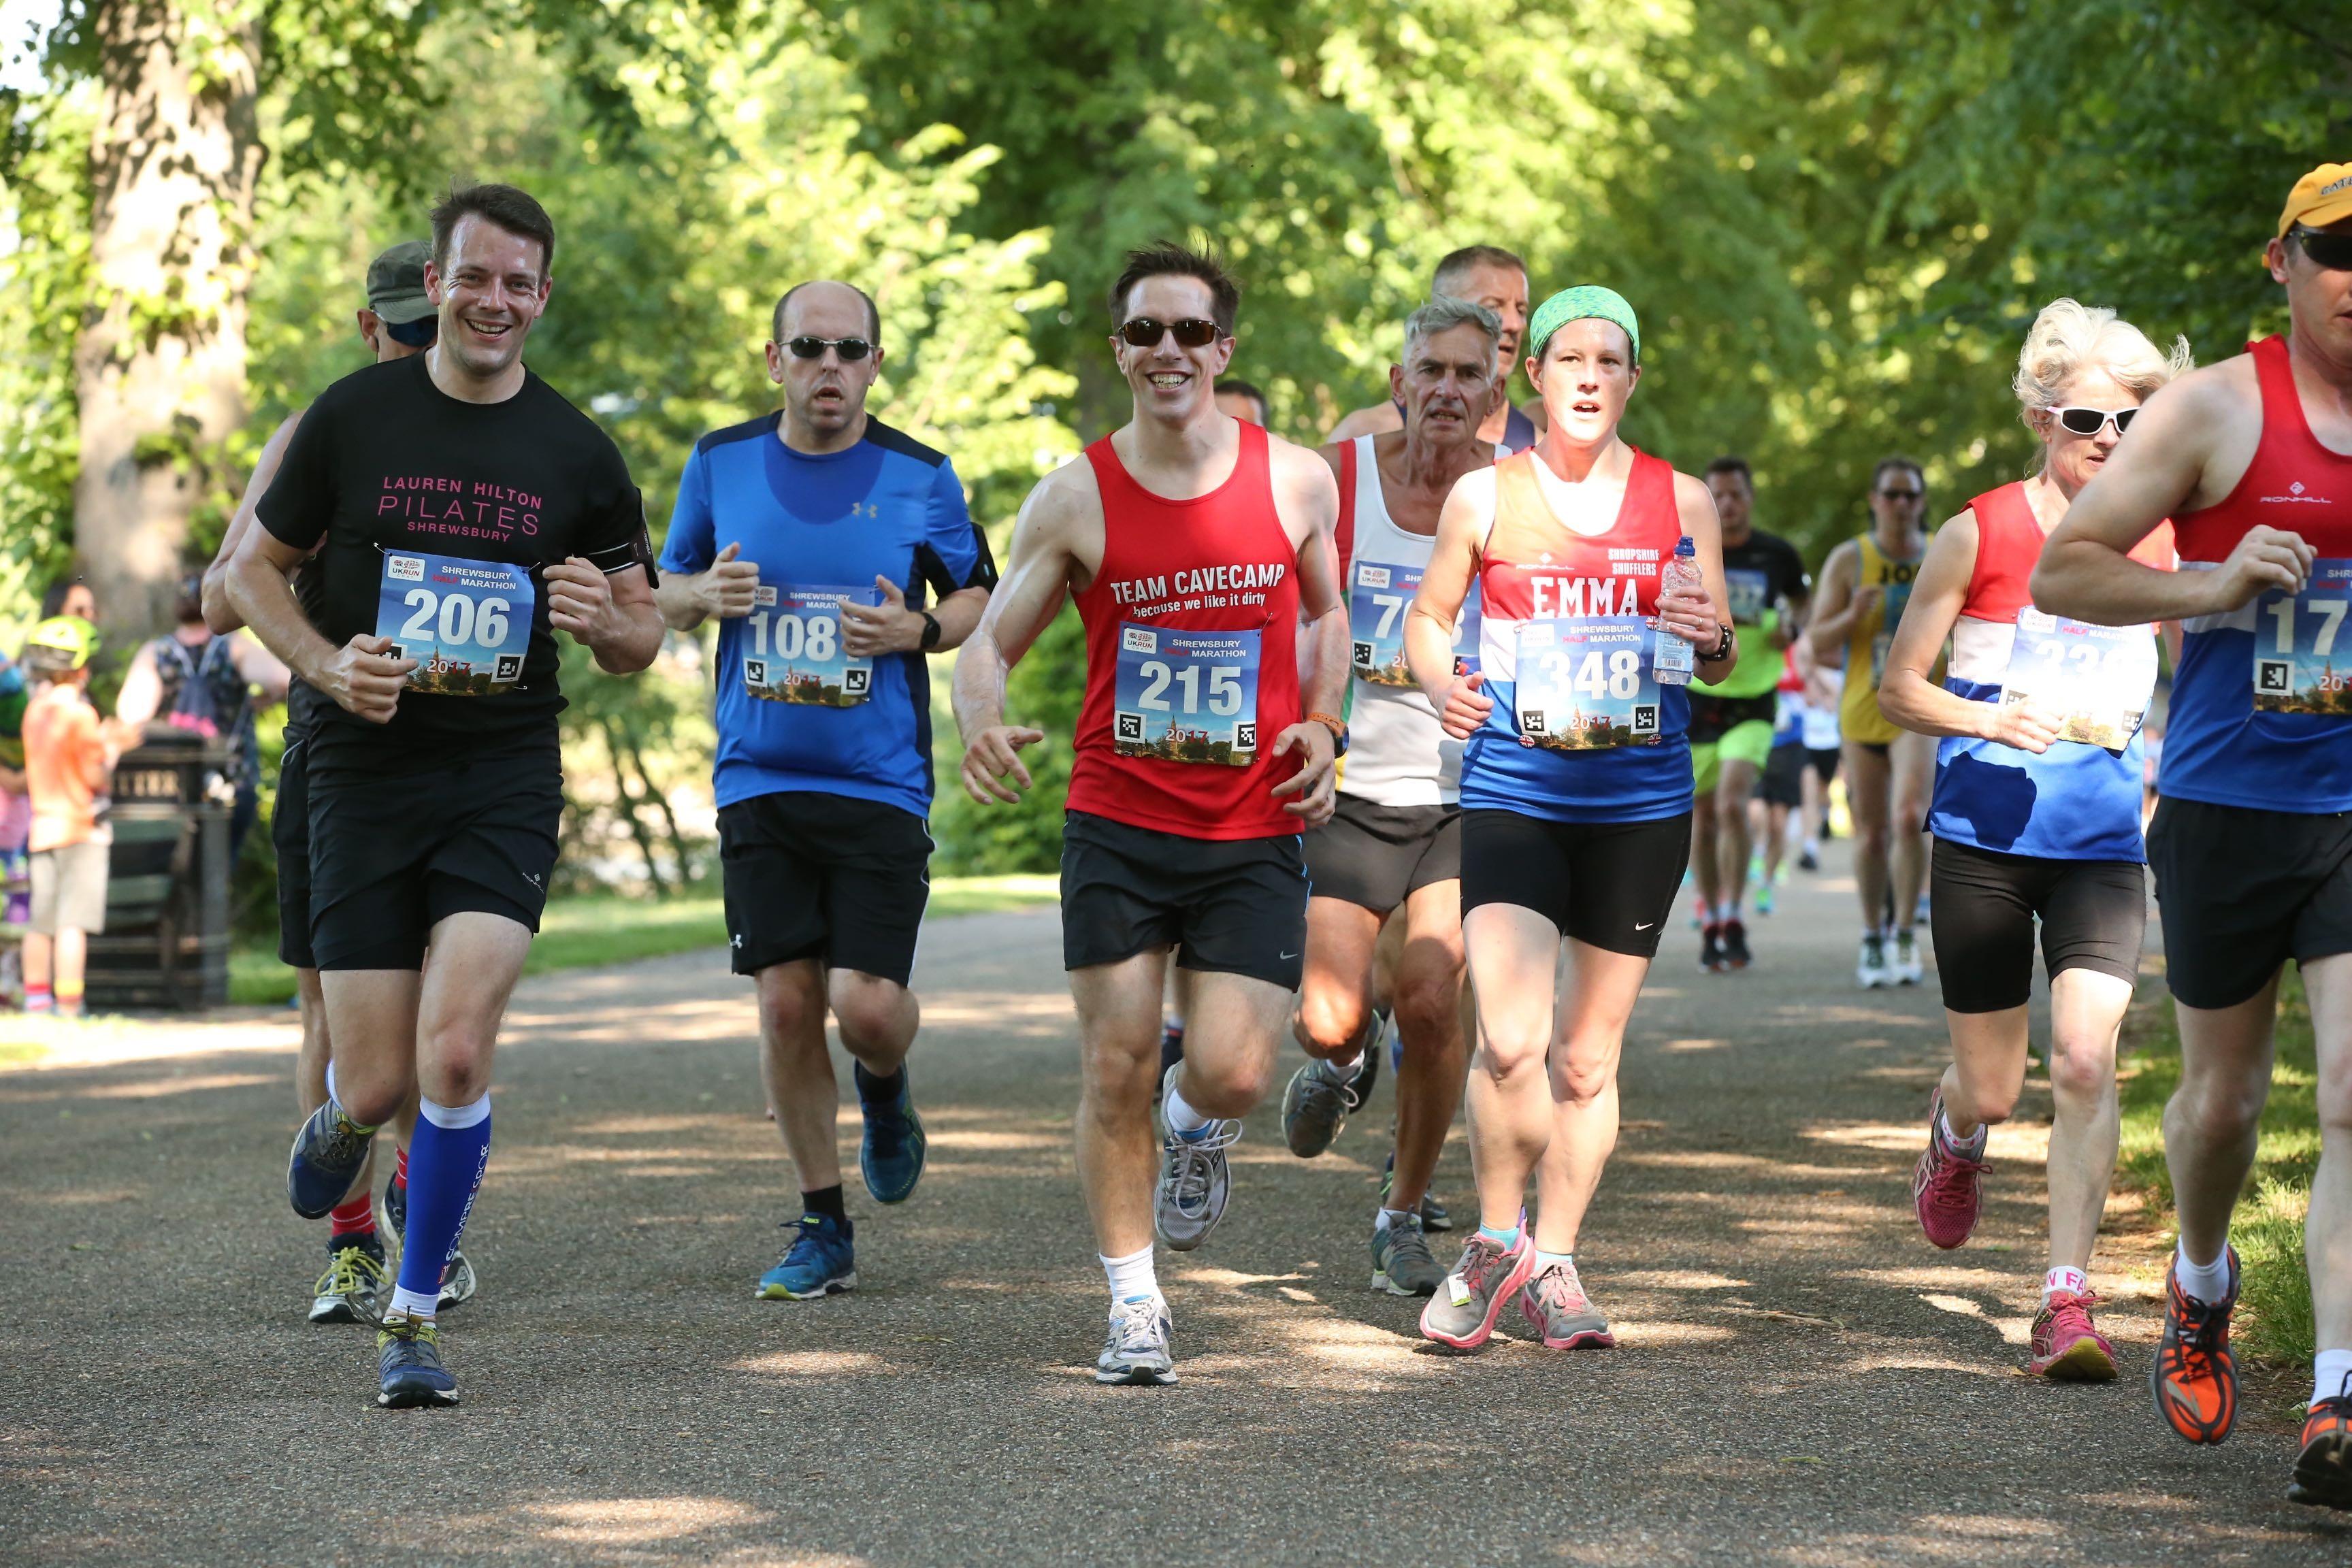 On Shrewsbury Half Marathon - cover image